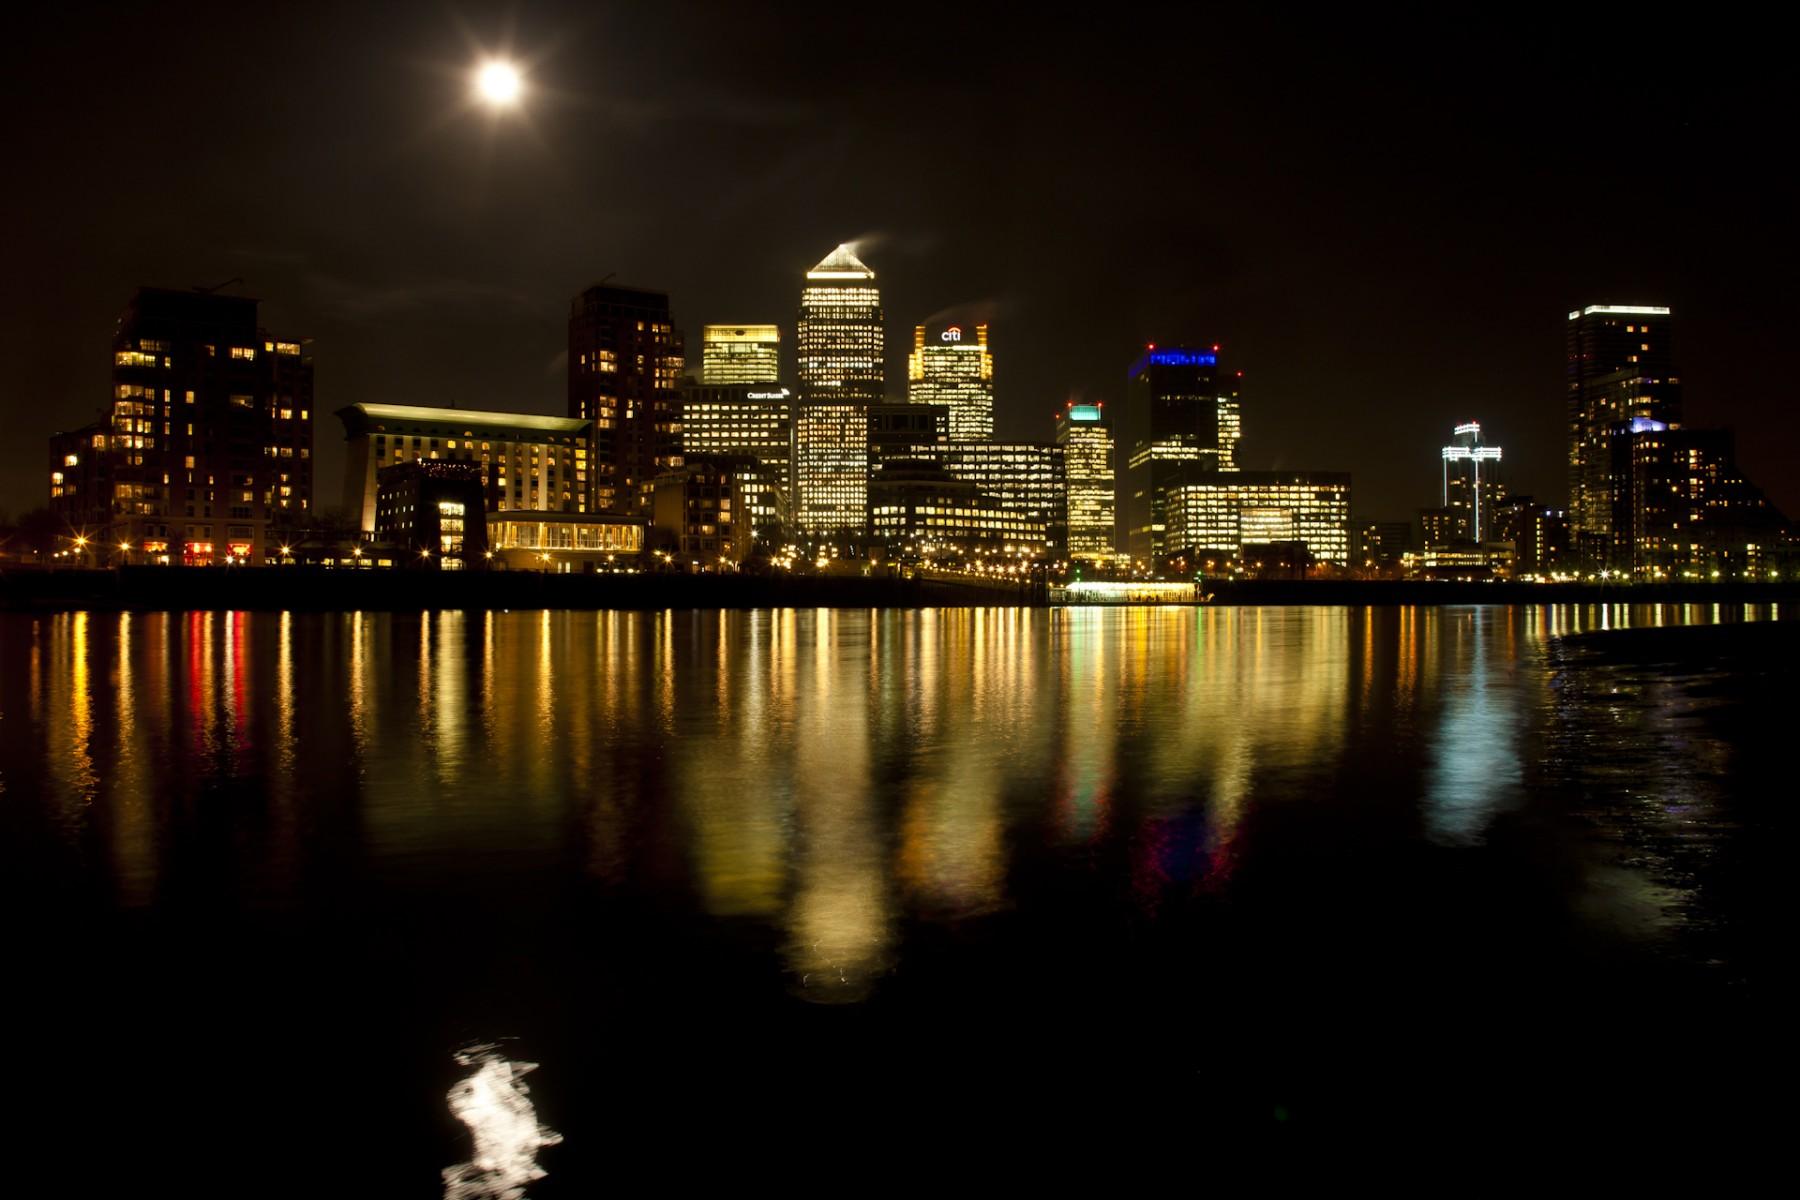 Full Moon Over Canary Wharf